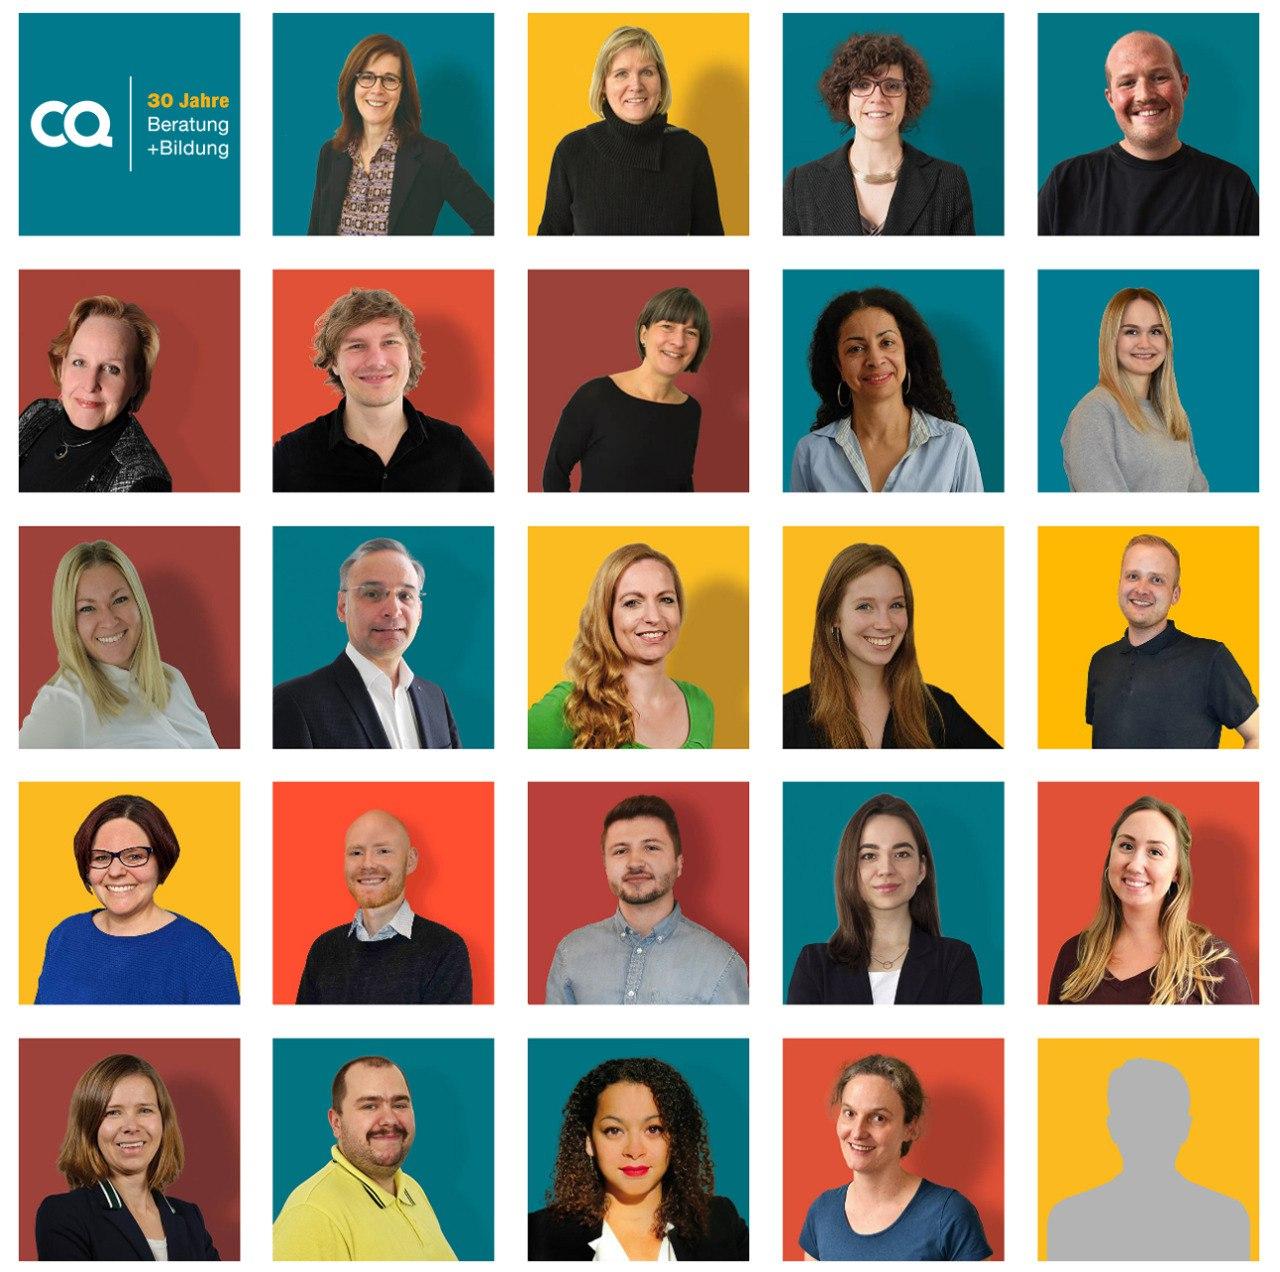 CQ Stellenangebot Jobs Newsletter